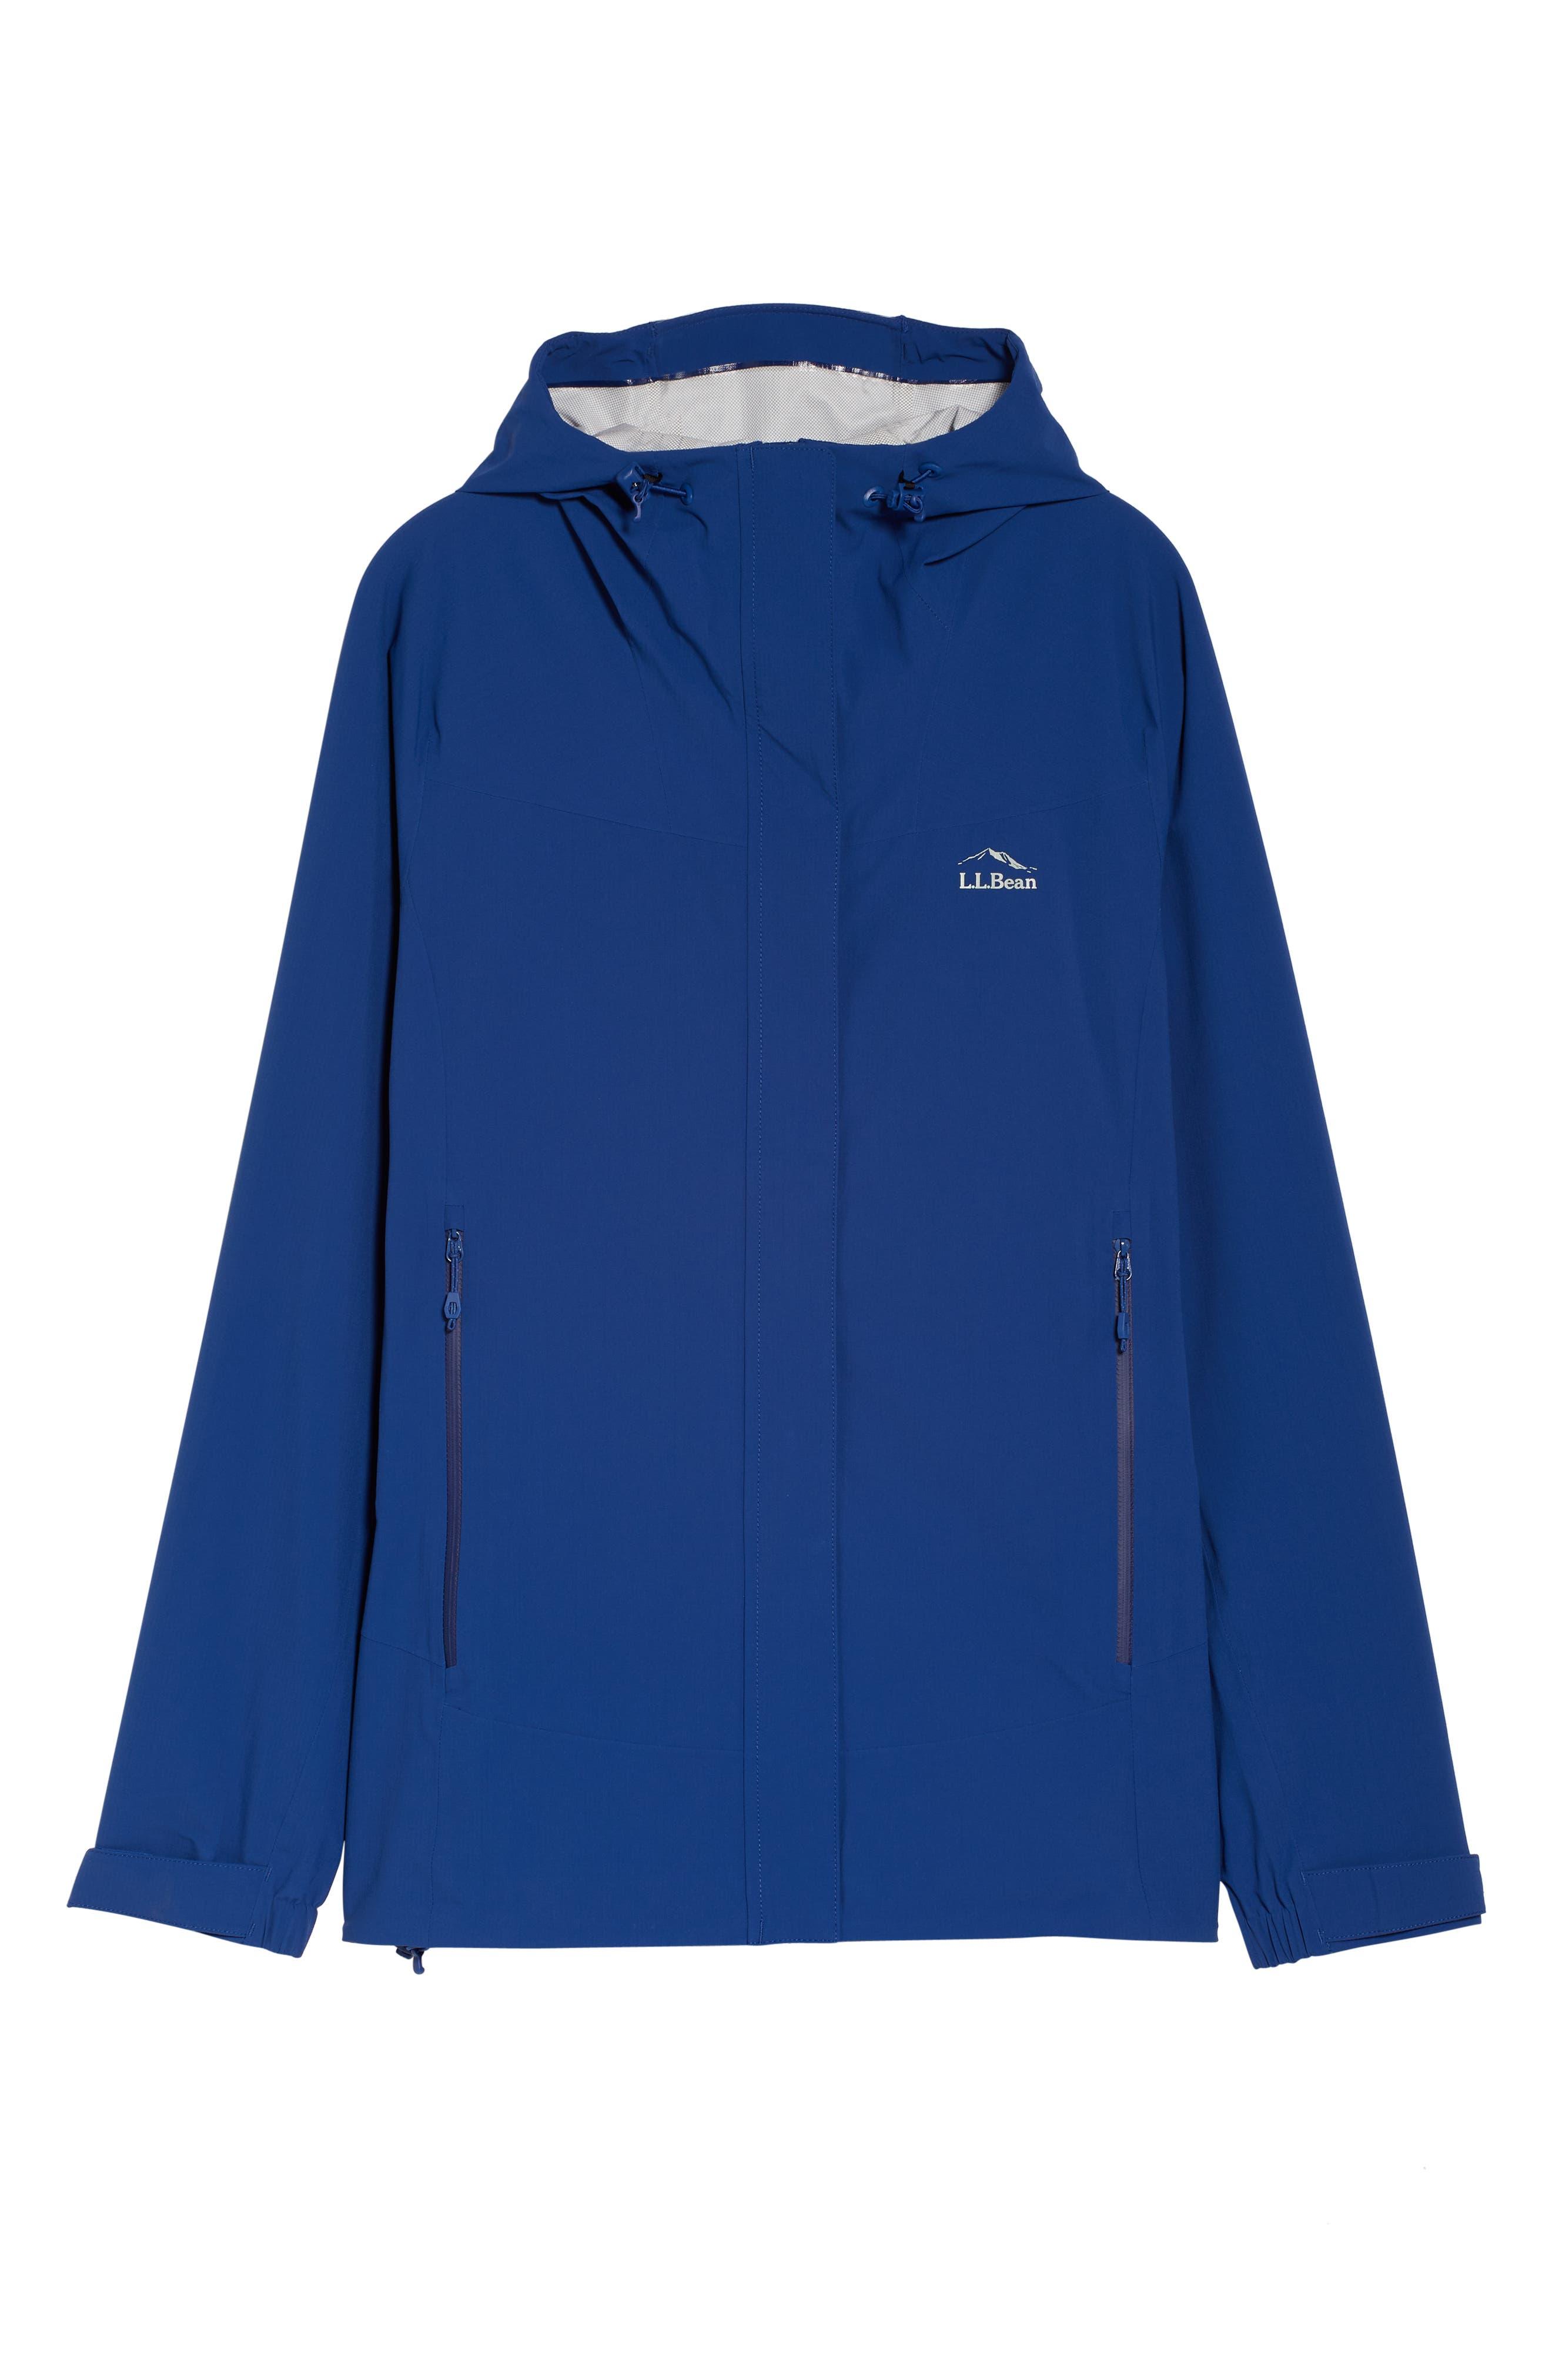 Cresta Stretch Waterproof Hooded Rain Jacket